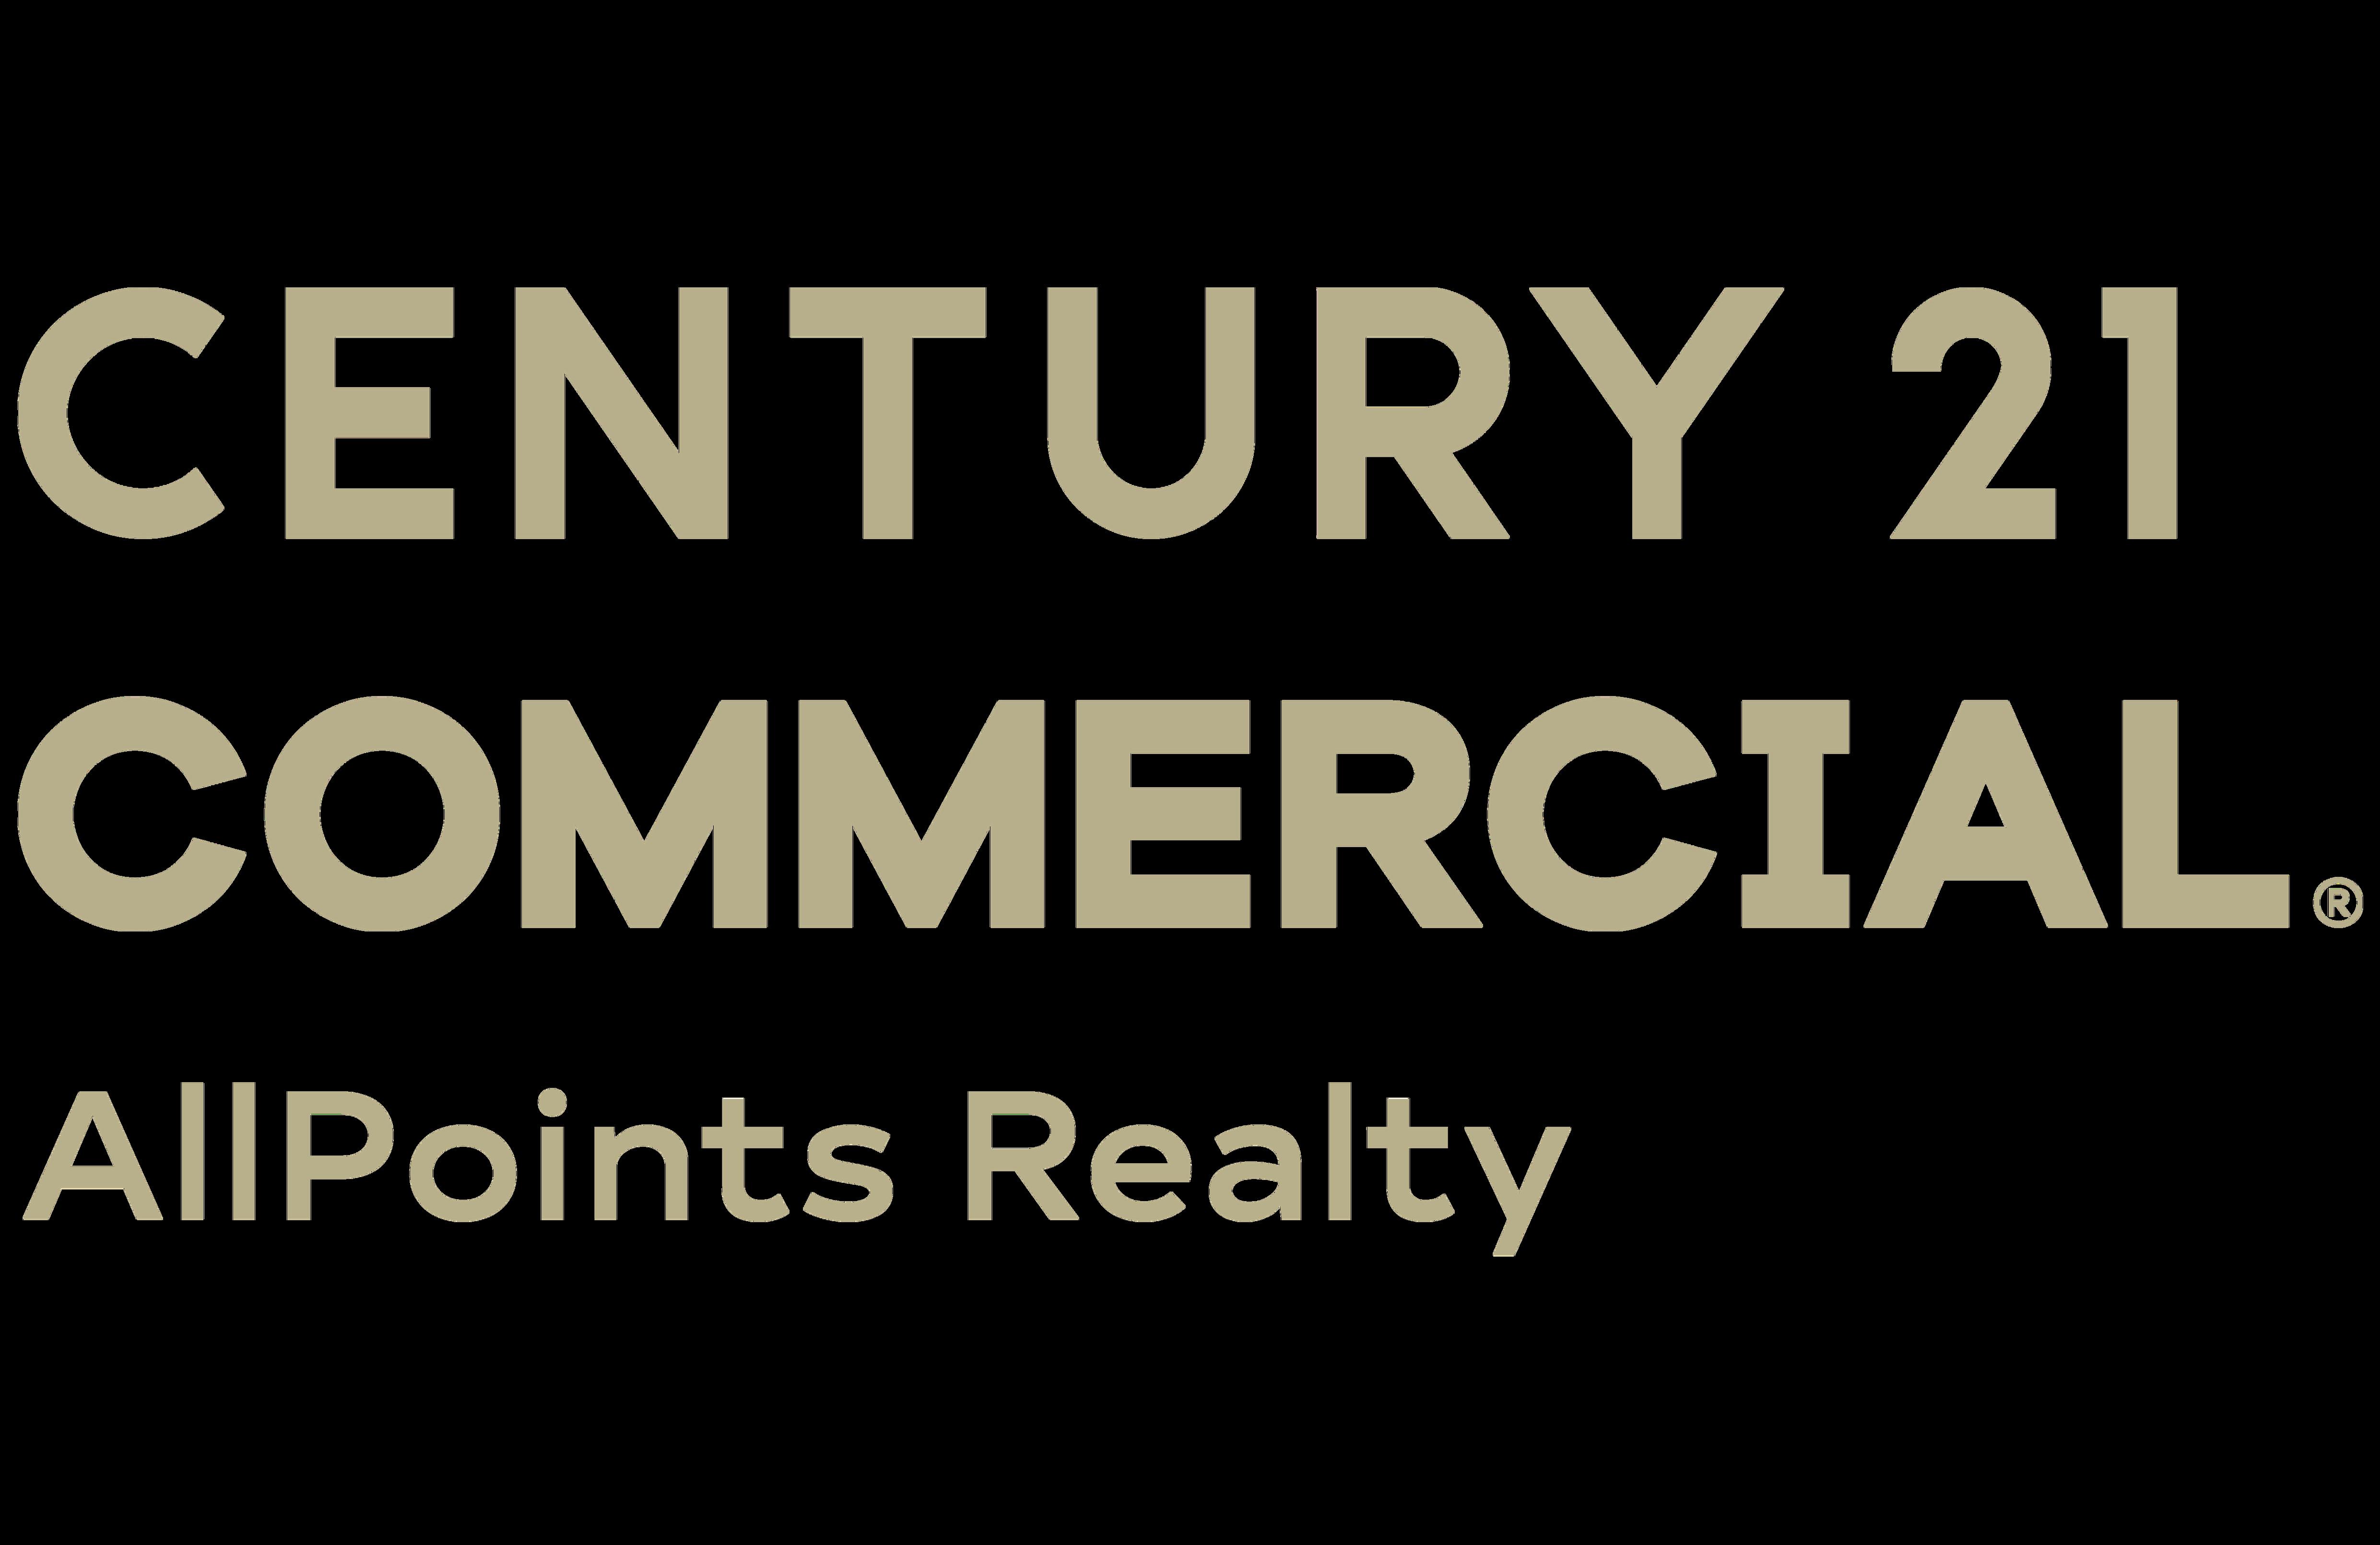 CENTURY 21 AllPoints Realty